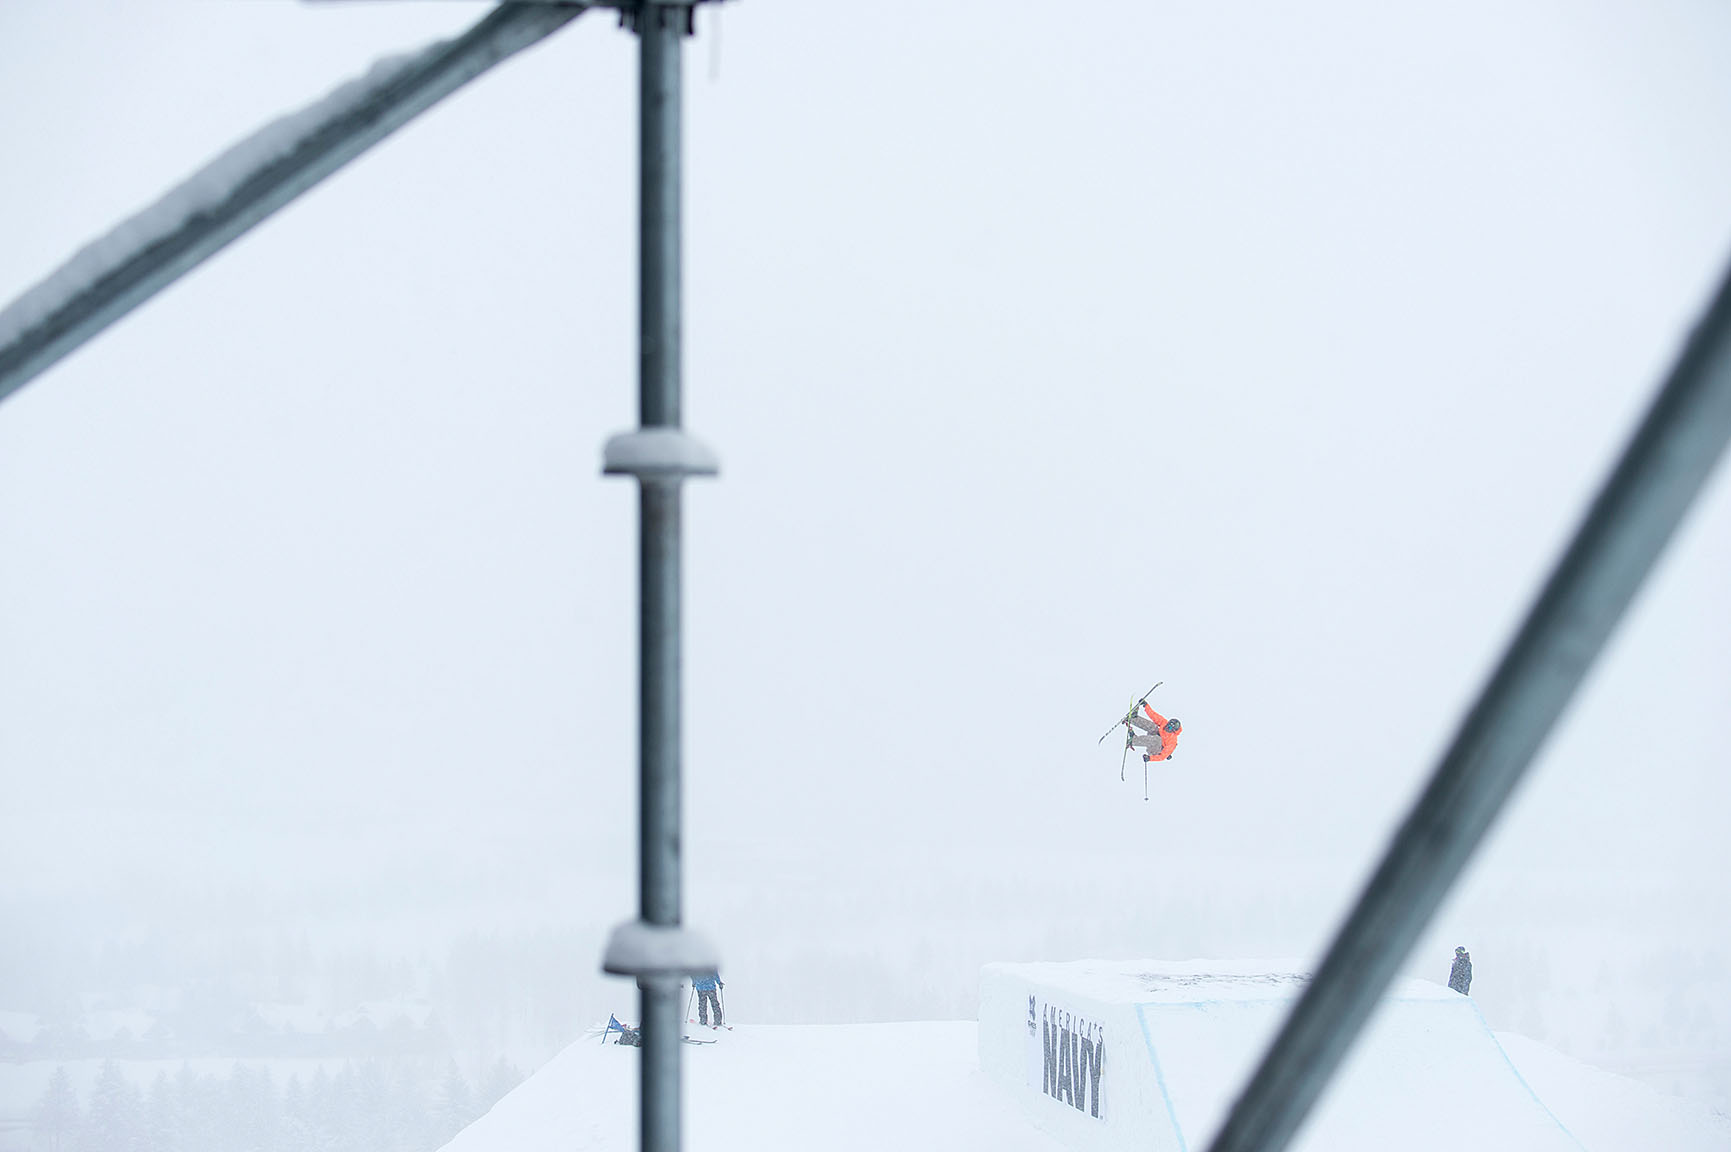 Alex Beaulieu-Marchand, Ski Slopestyle practice